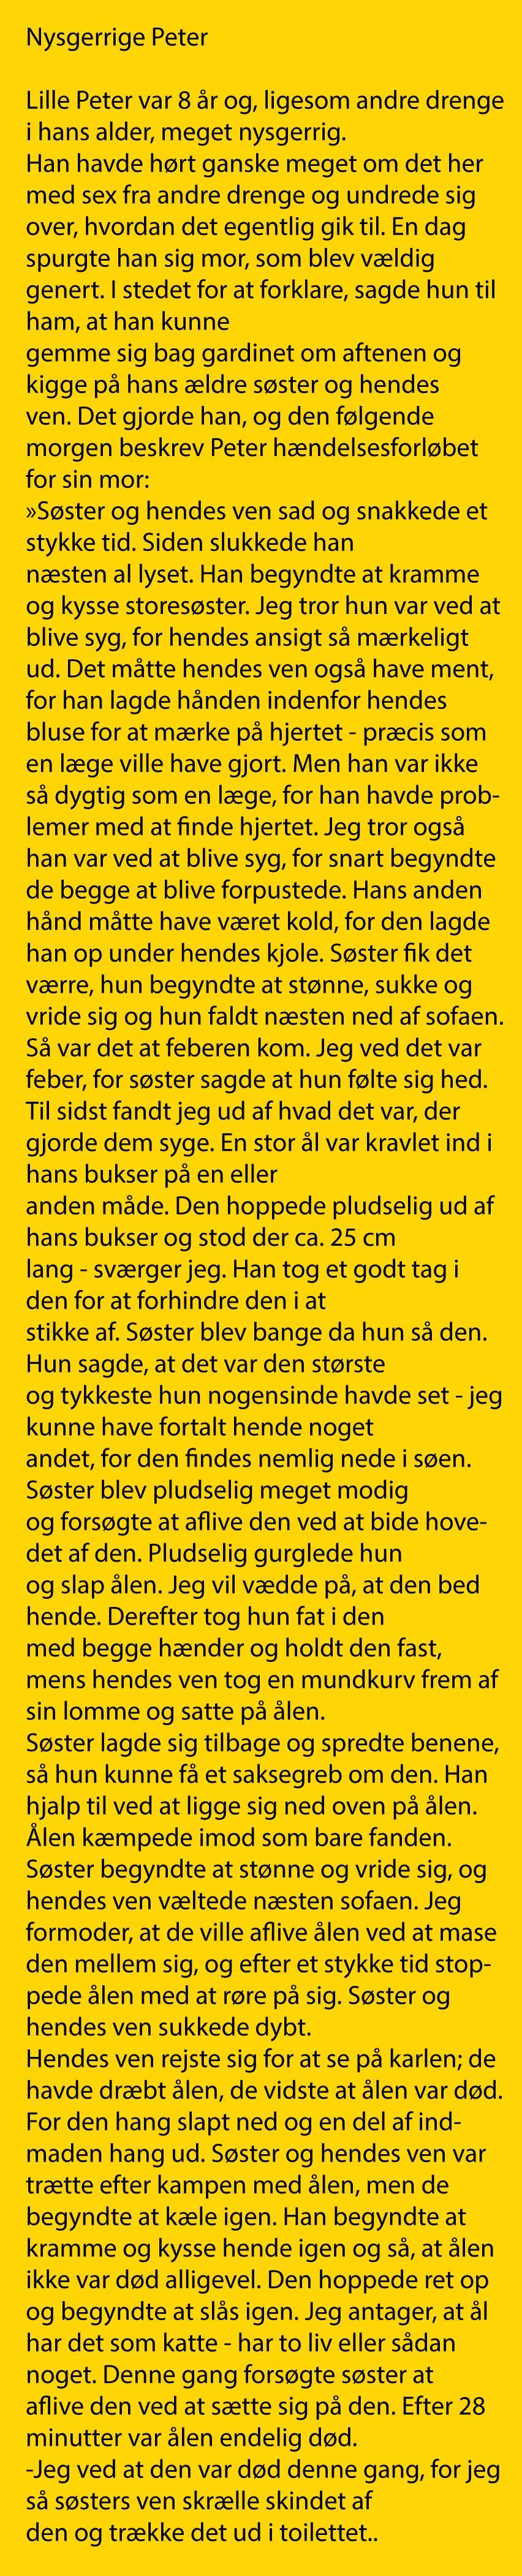 meget små bryster sjove gamle danske ord